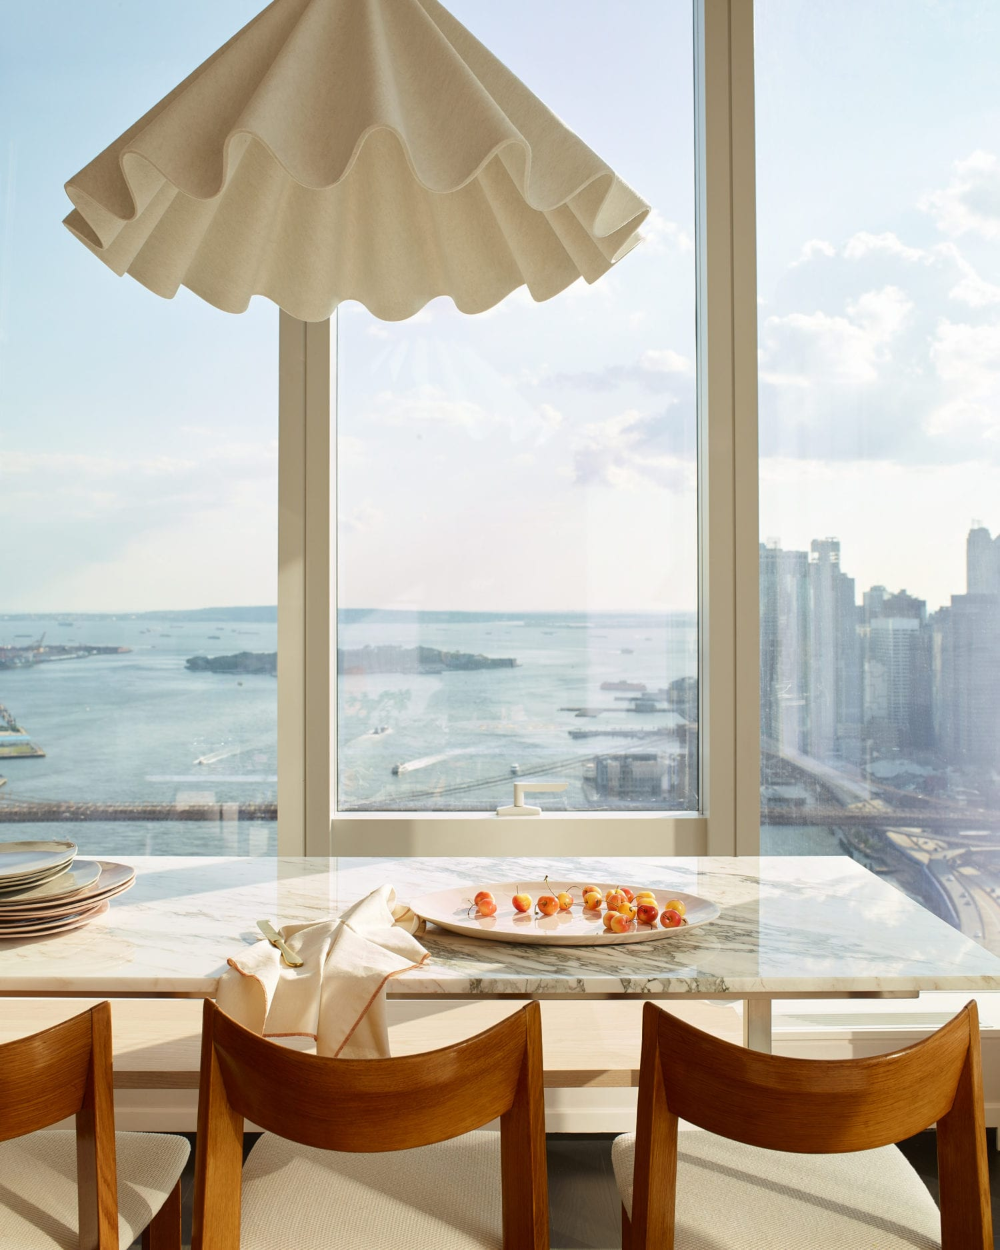 Anna Karlin Designs 11 Model Apartments for One Manhattan